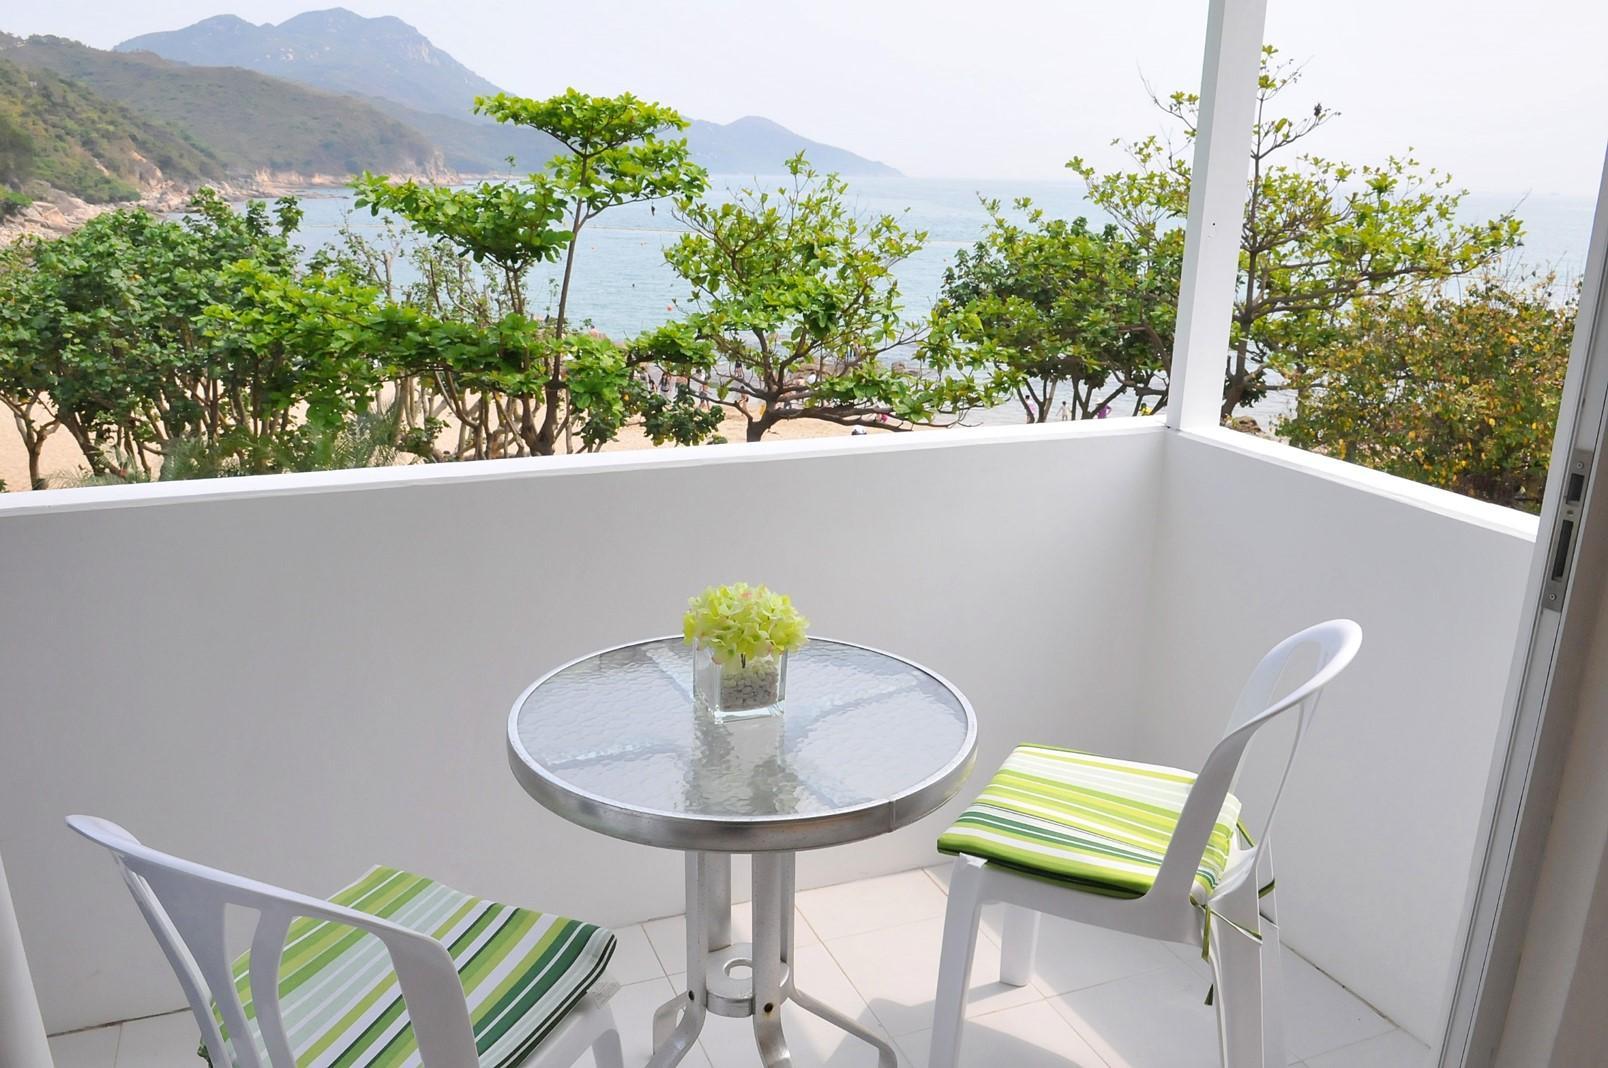 Bayshore Inn   Double Room With Open View Balcony P9